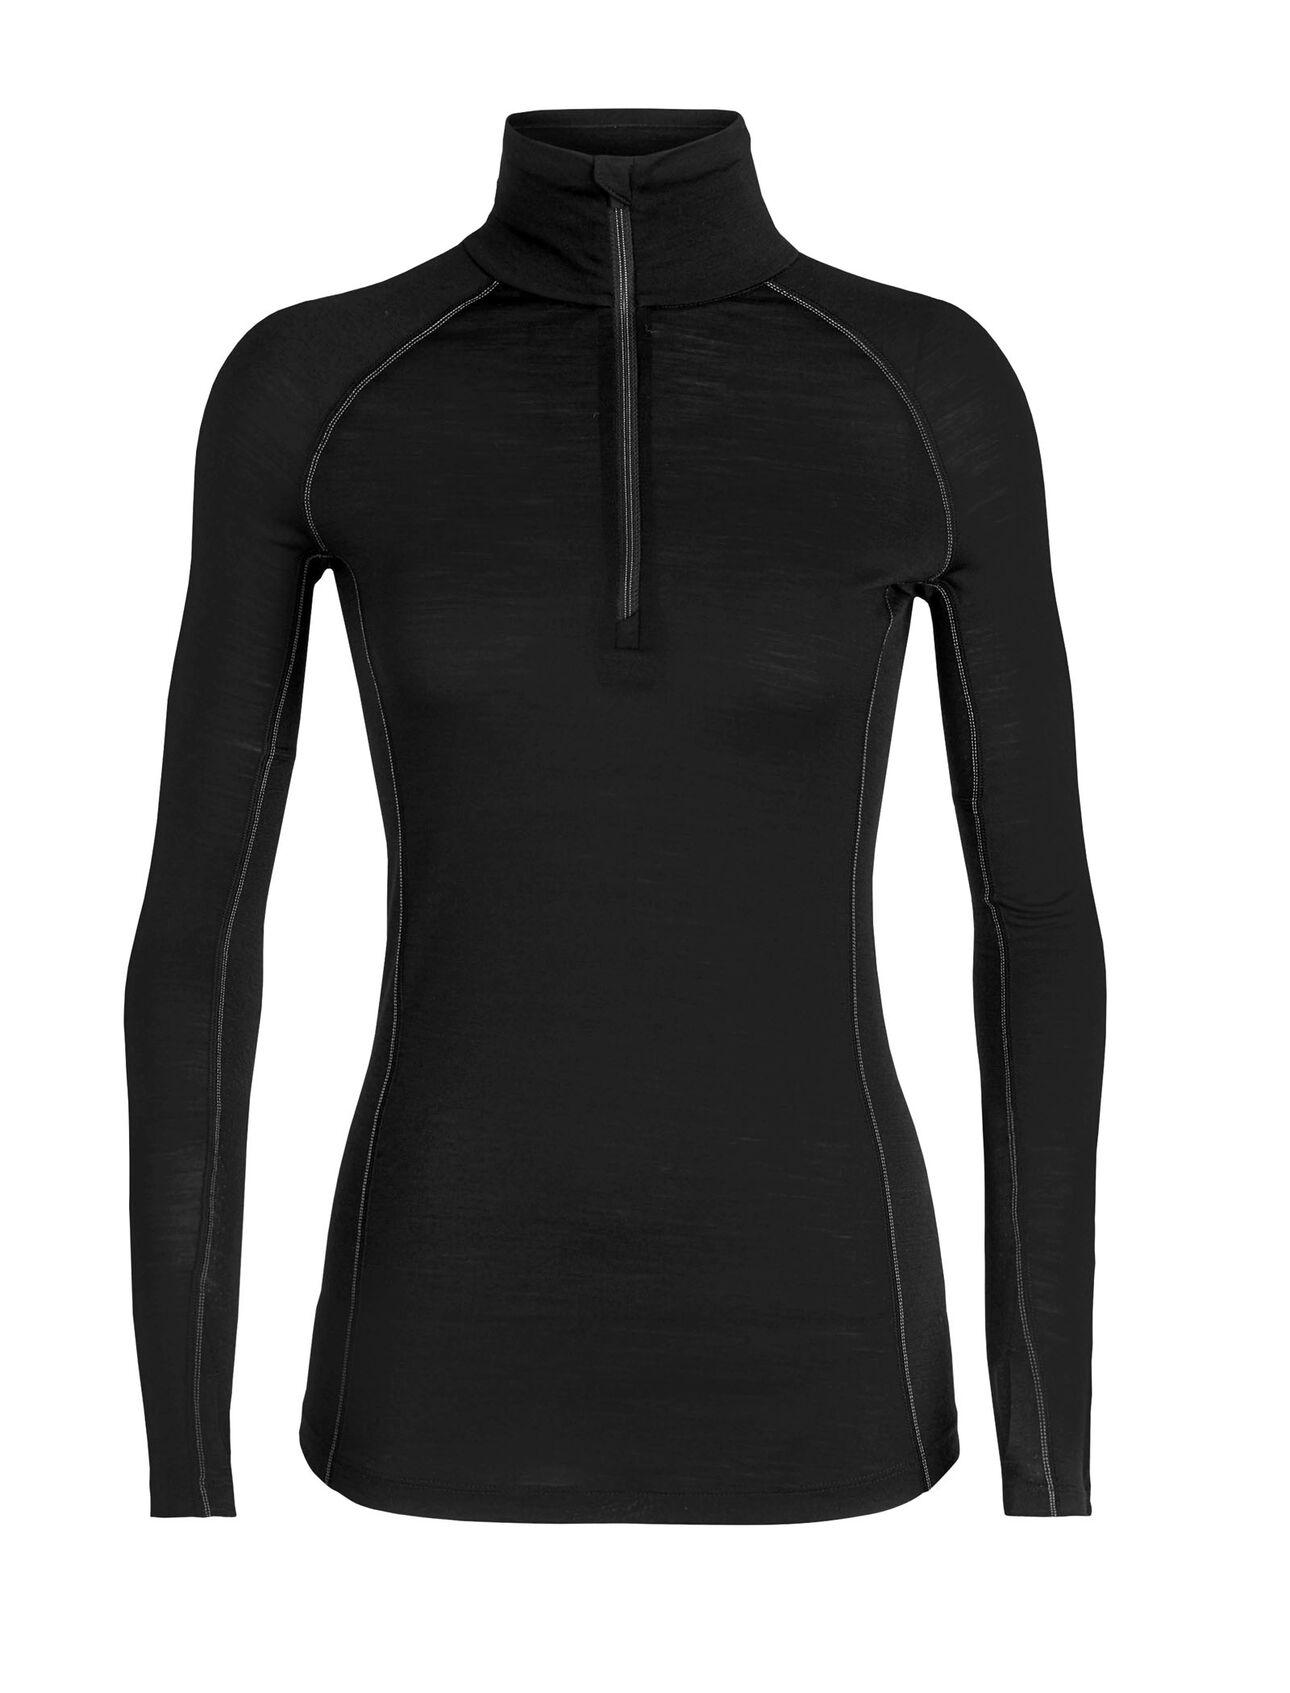 BodyFitZone™ 150 Zone长袖半拉链上衣